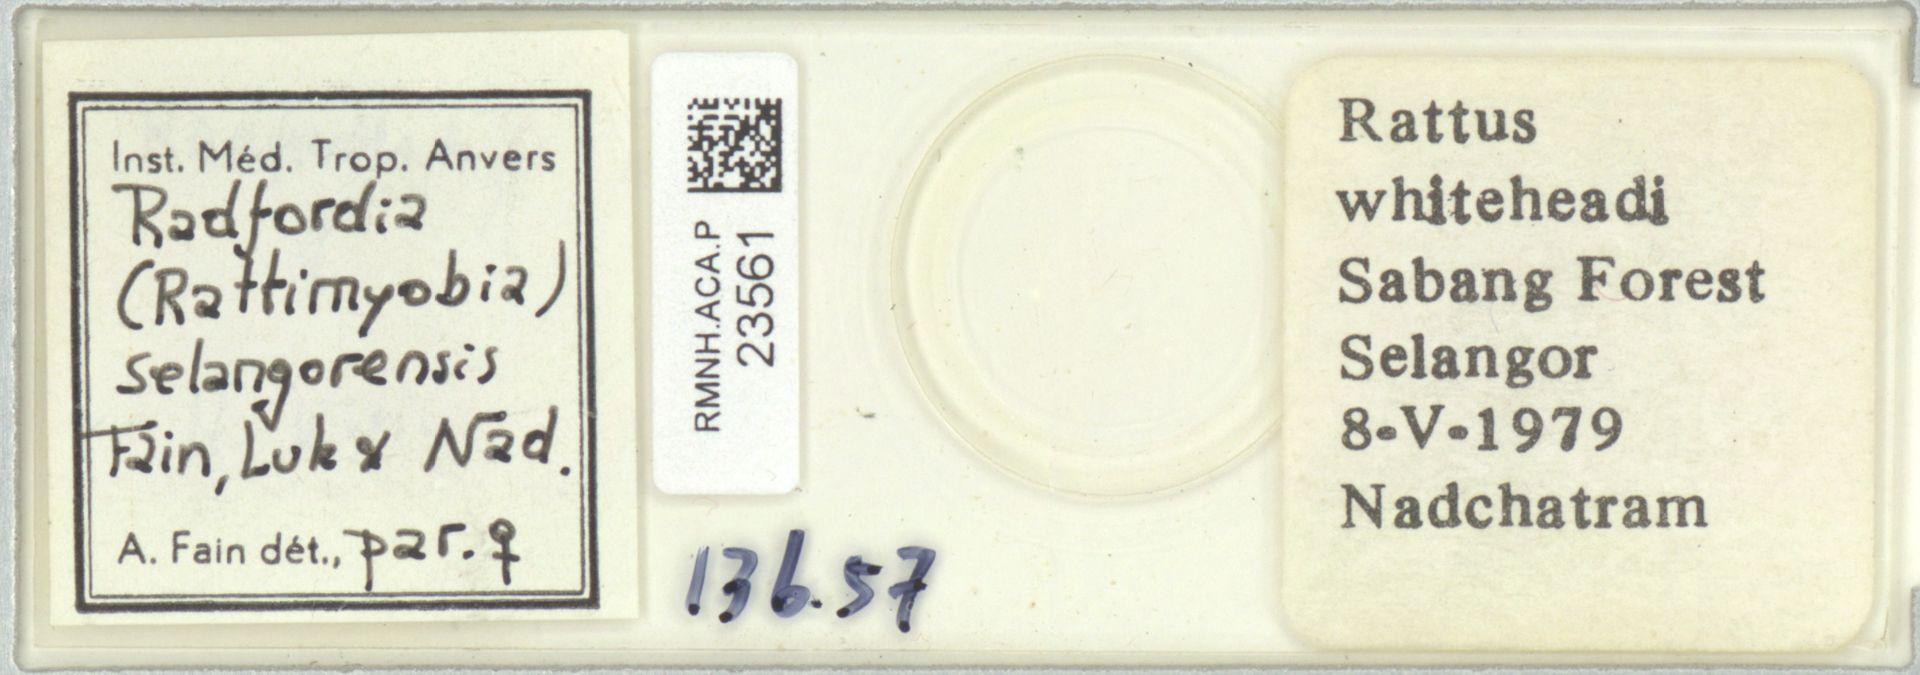 RMNH.ACA.P.23561 | Radfordia (Rattimyobia) selangorensis Fain, Luk & Nad